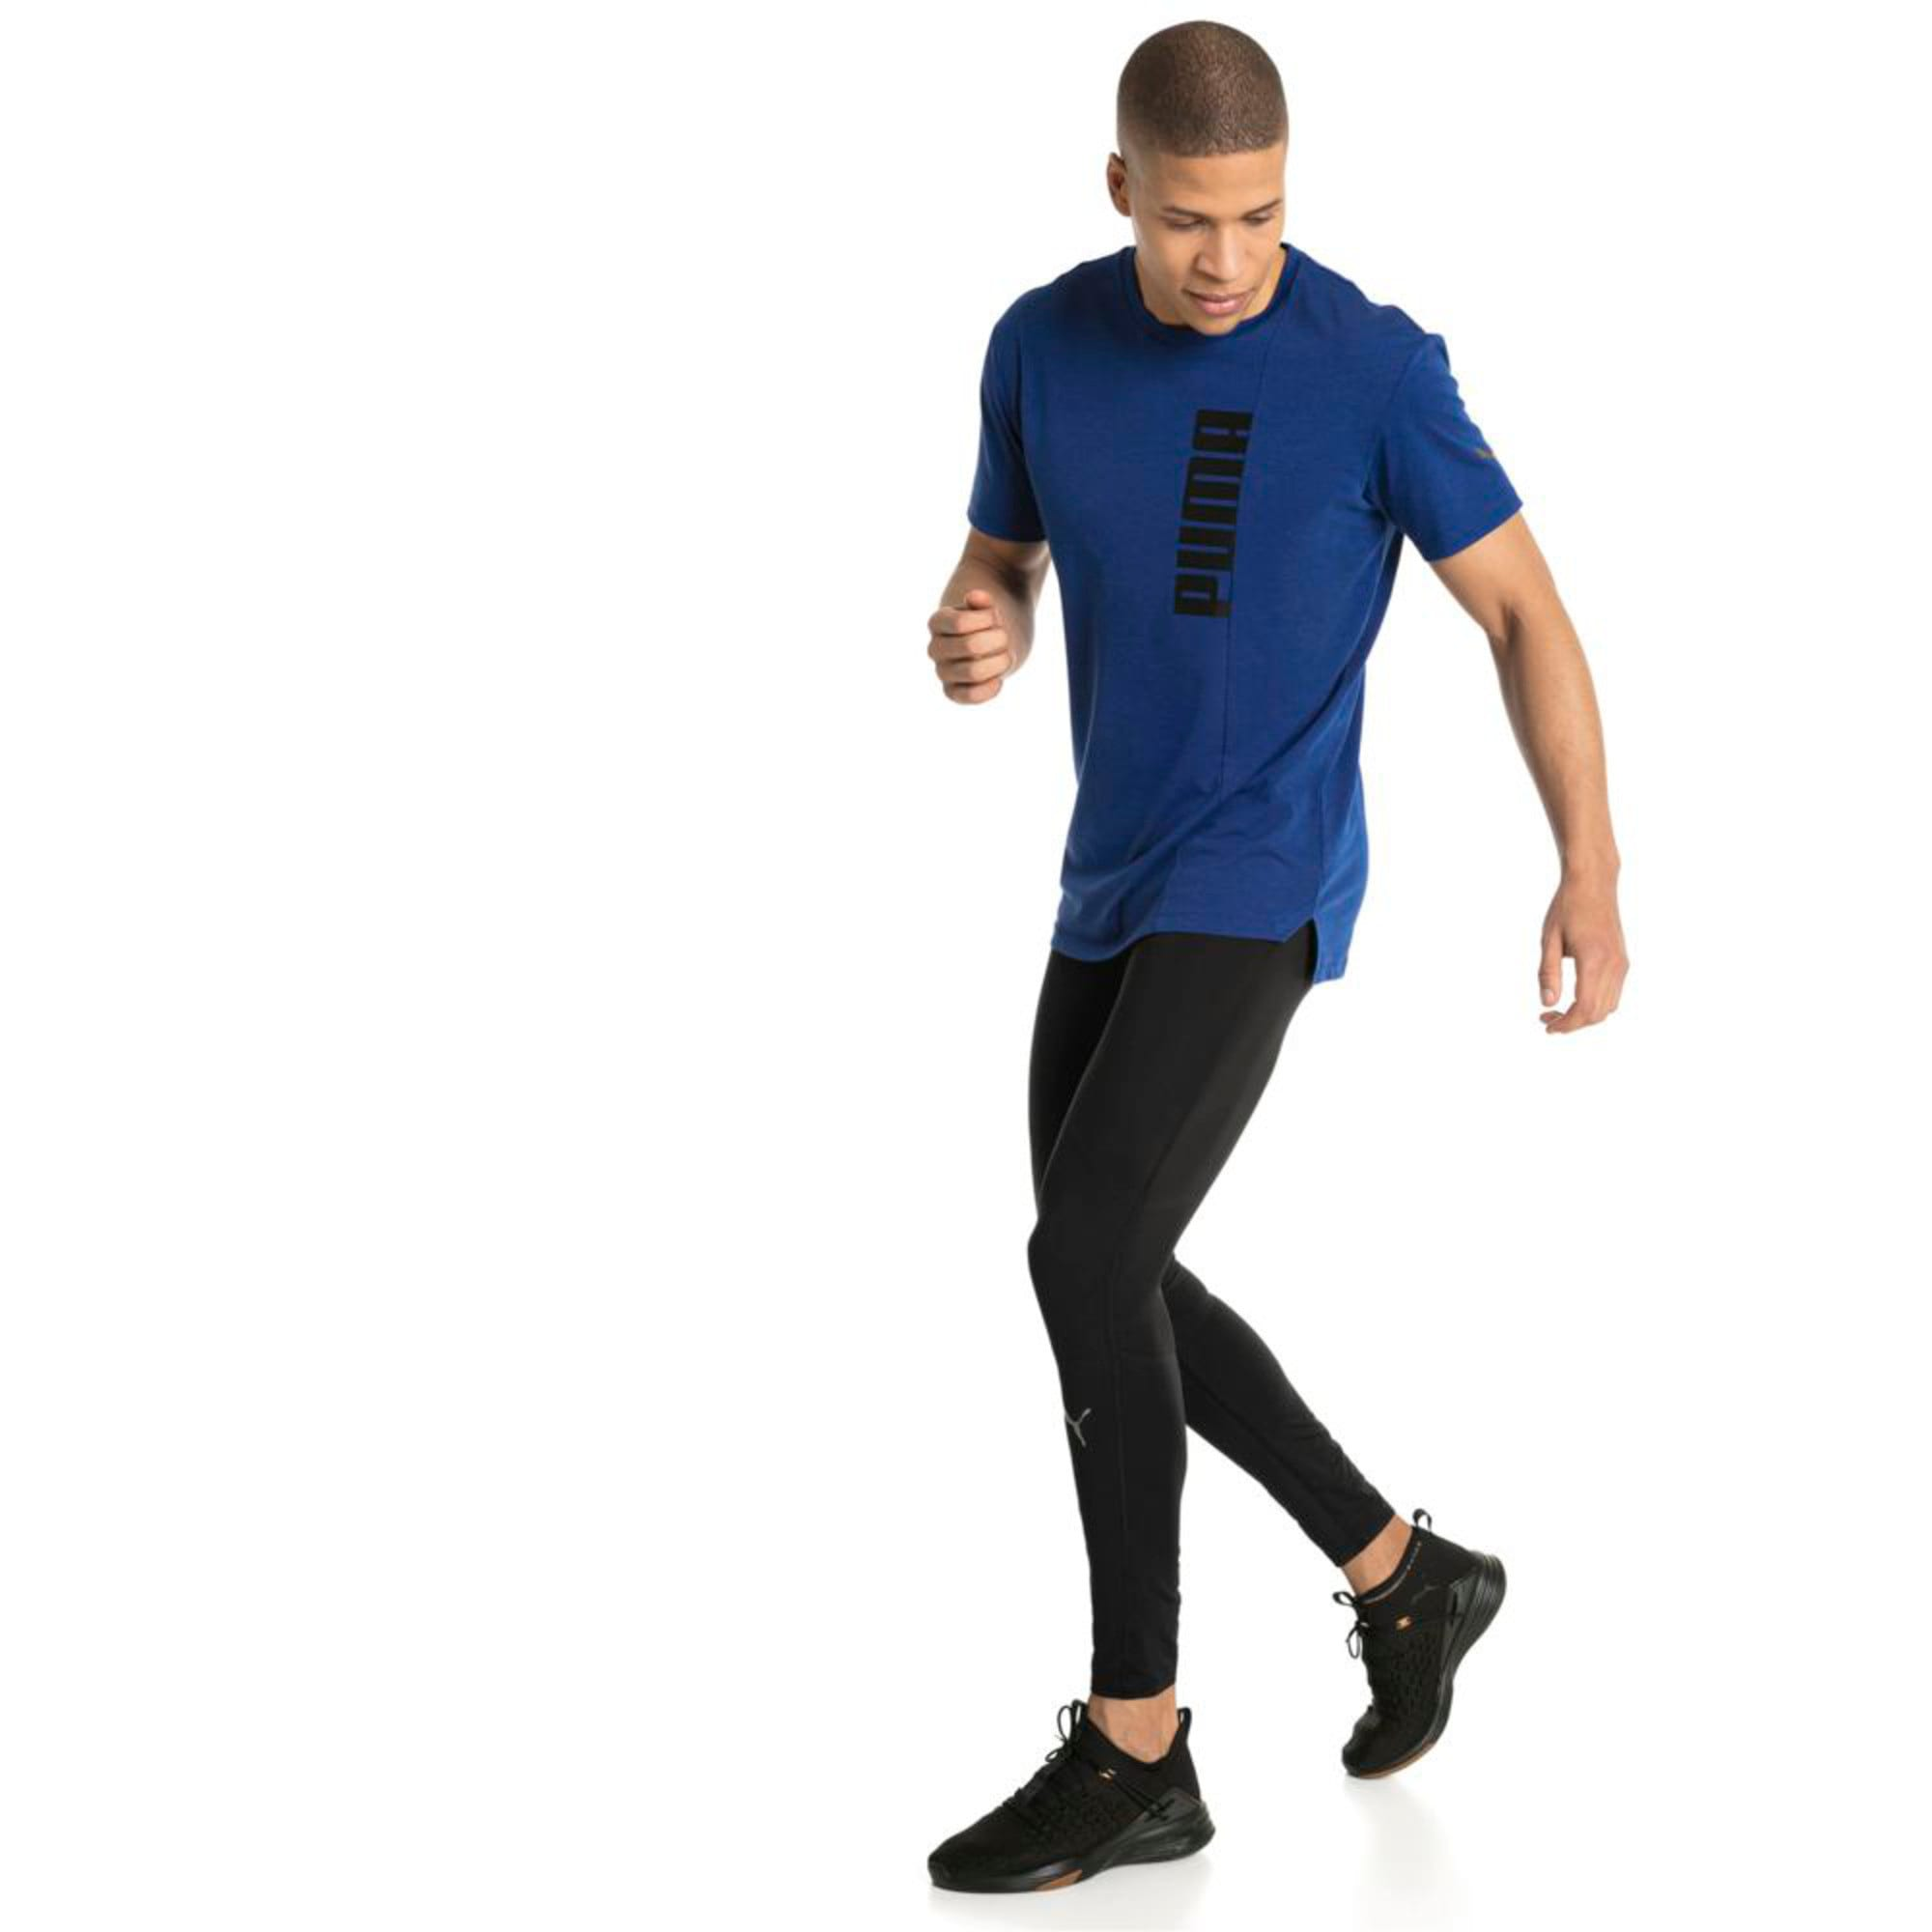 Thumbnail 2 of Energy Triblend Graphic Men's Running Tee, Sodalite Blue, medium-IND